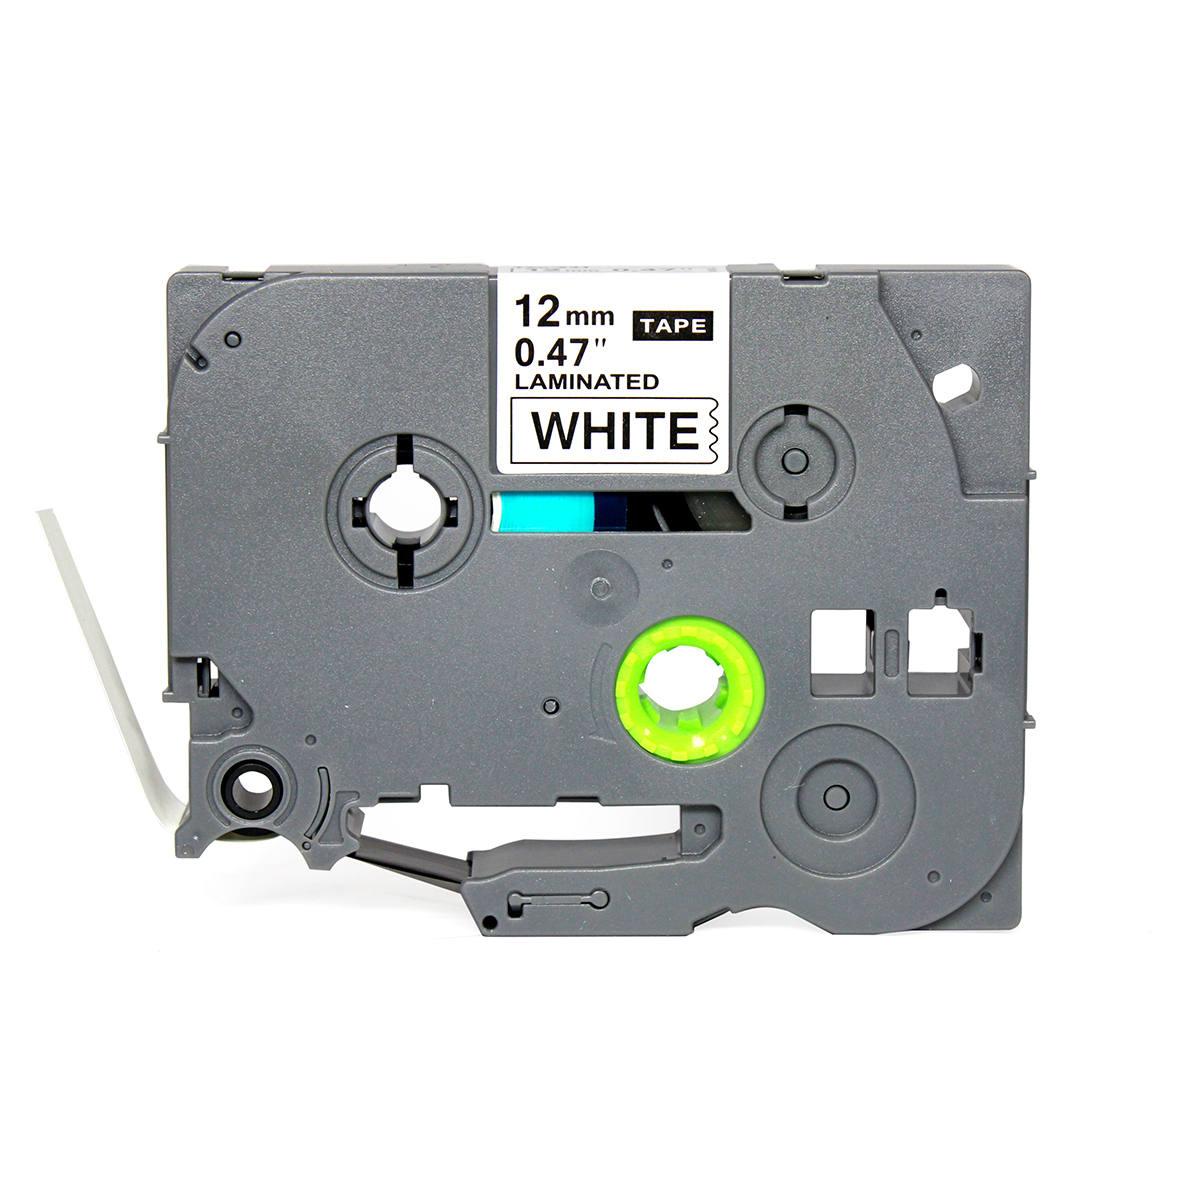 Fita Compatível para Rotulador 12mm x 8m Branco/Preto Marca X-Full Referência TZc-231 TZe-231 TZ-231 para Brother